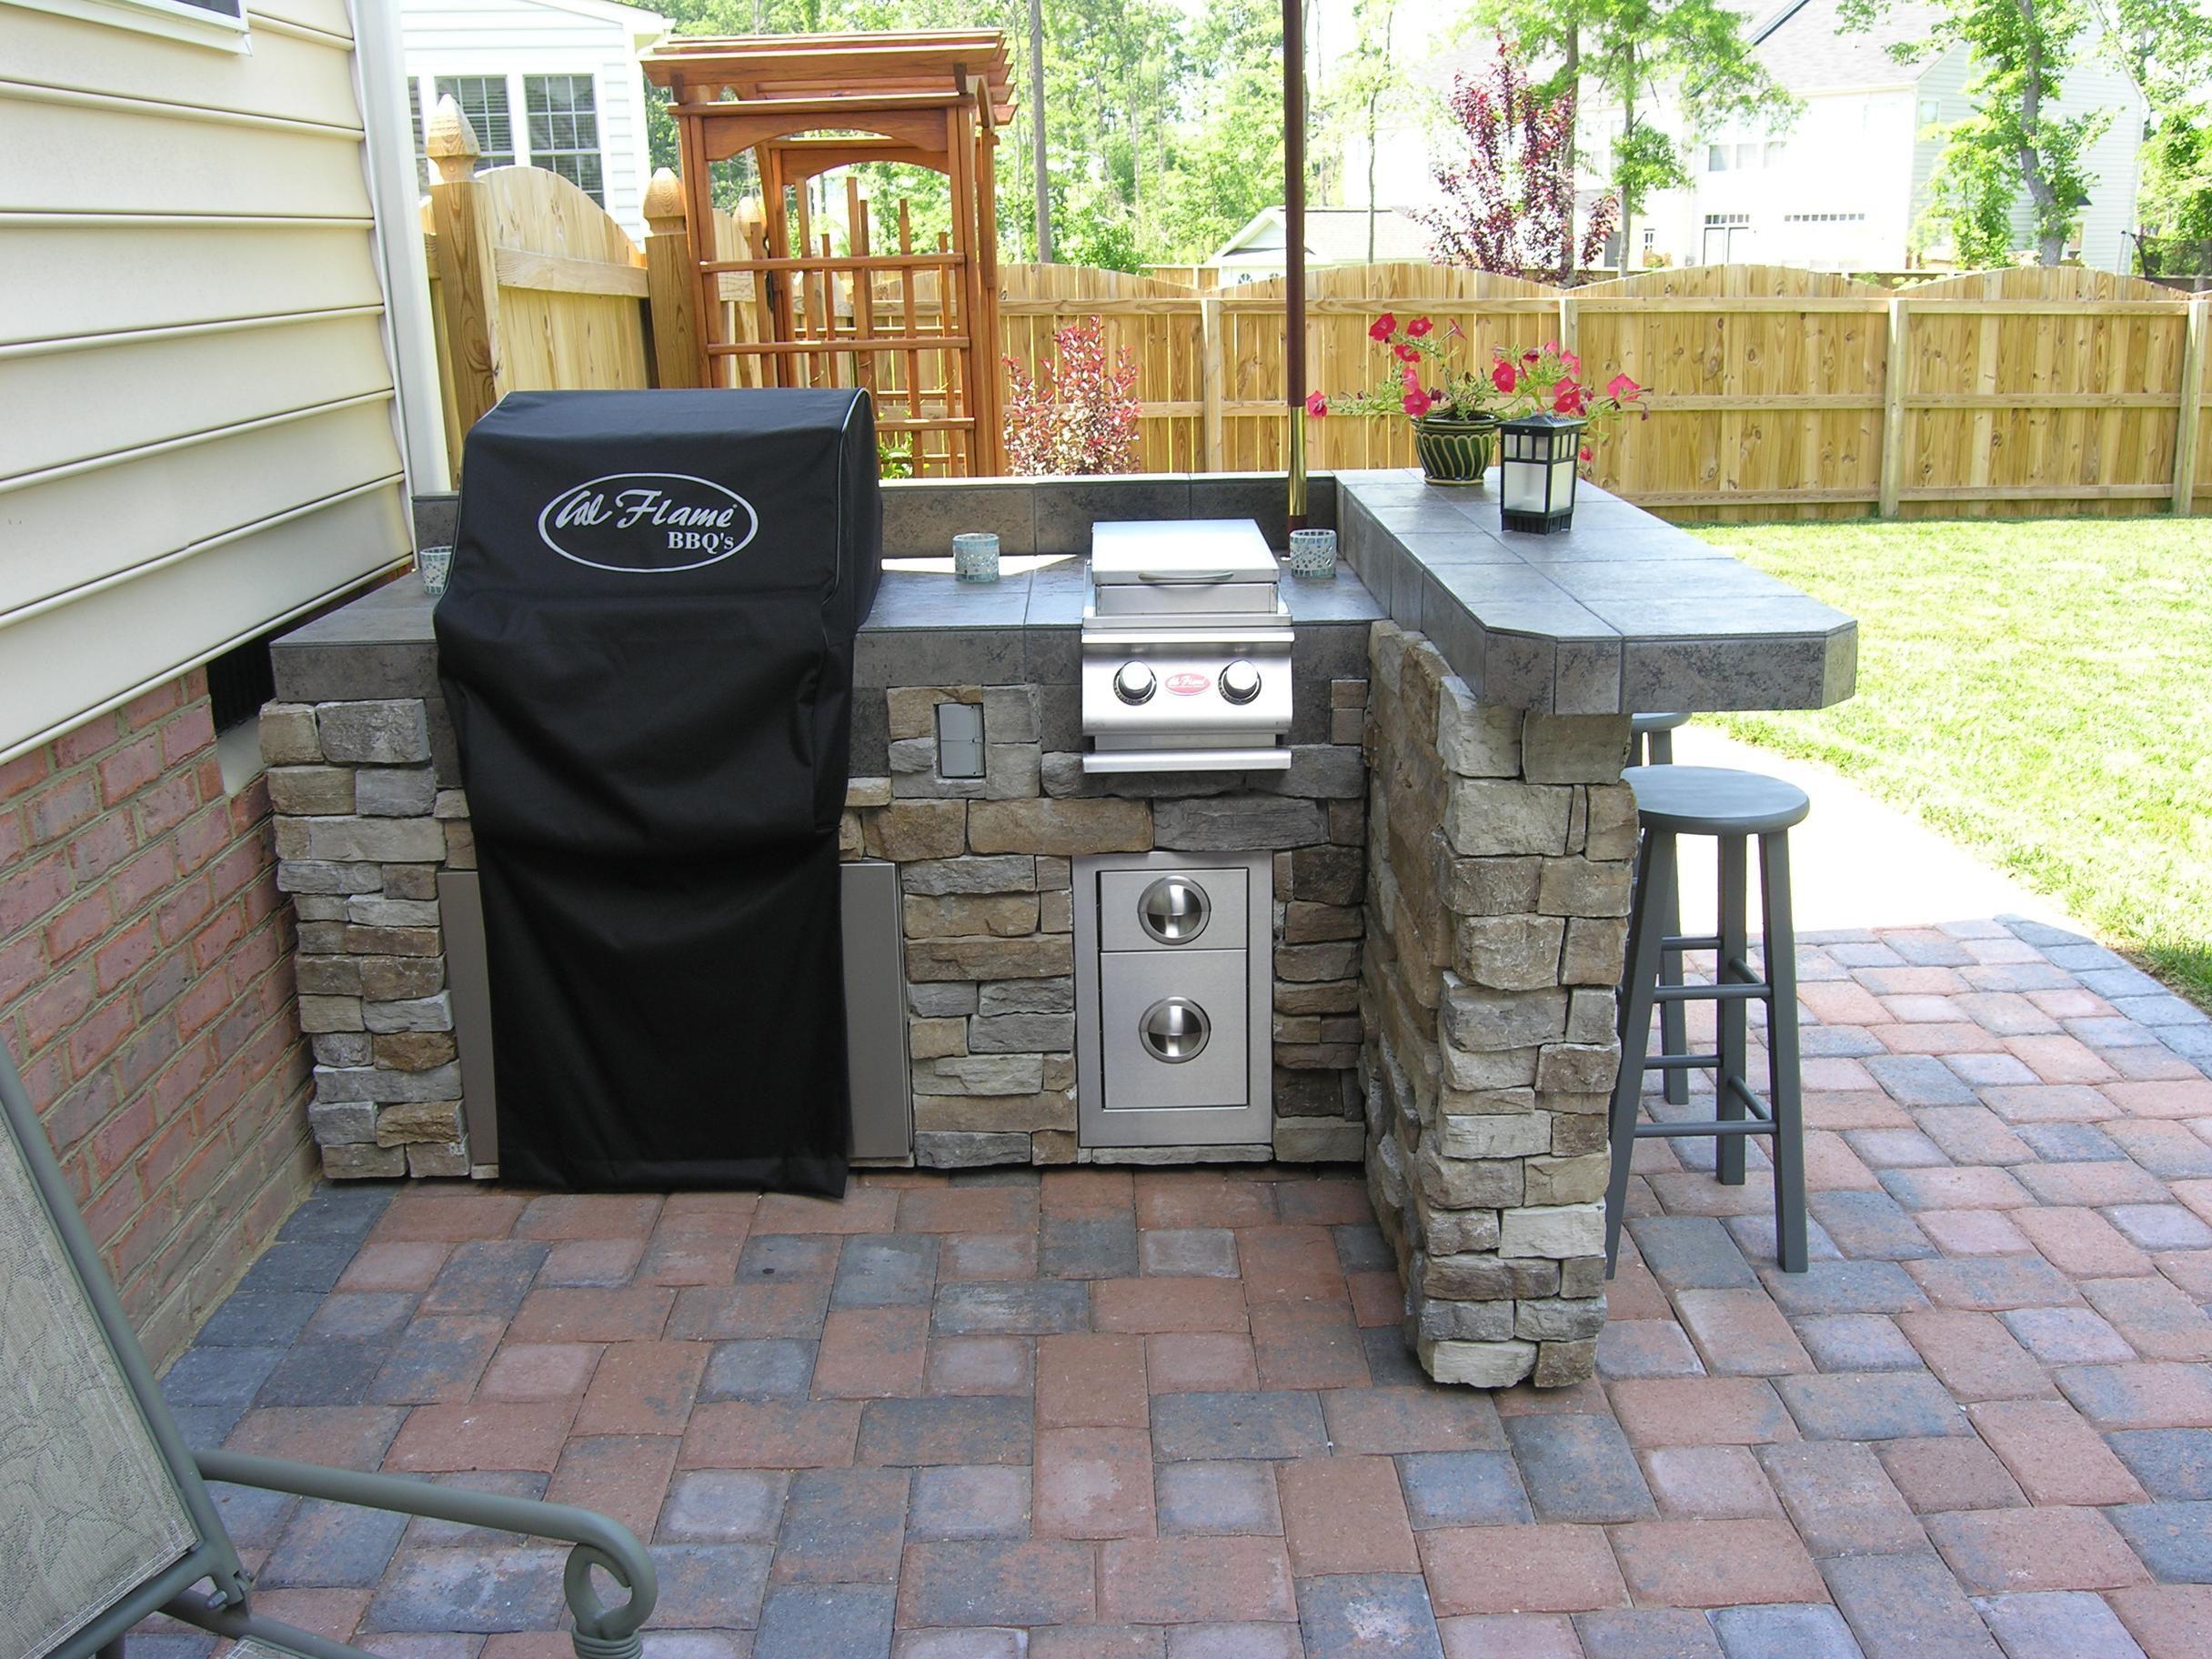 Small Backyard Bar Kitchen Small Outdoor Kitchens Outdoor Kitchen Decor Outdoor Kitchen Plans